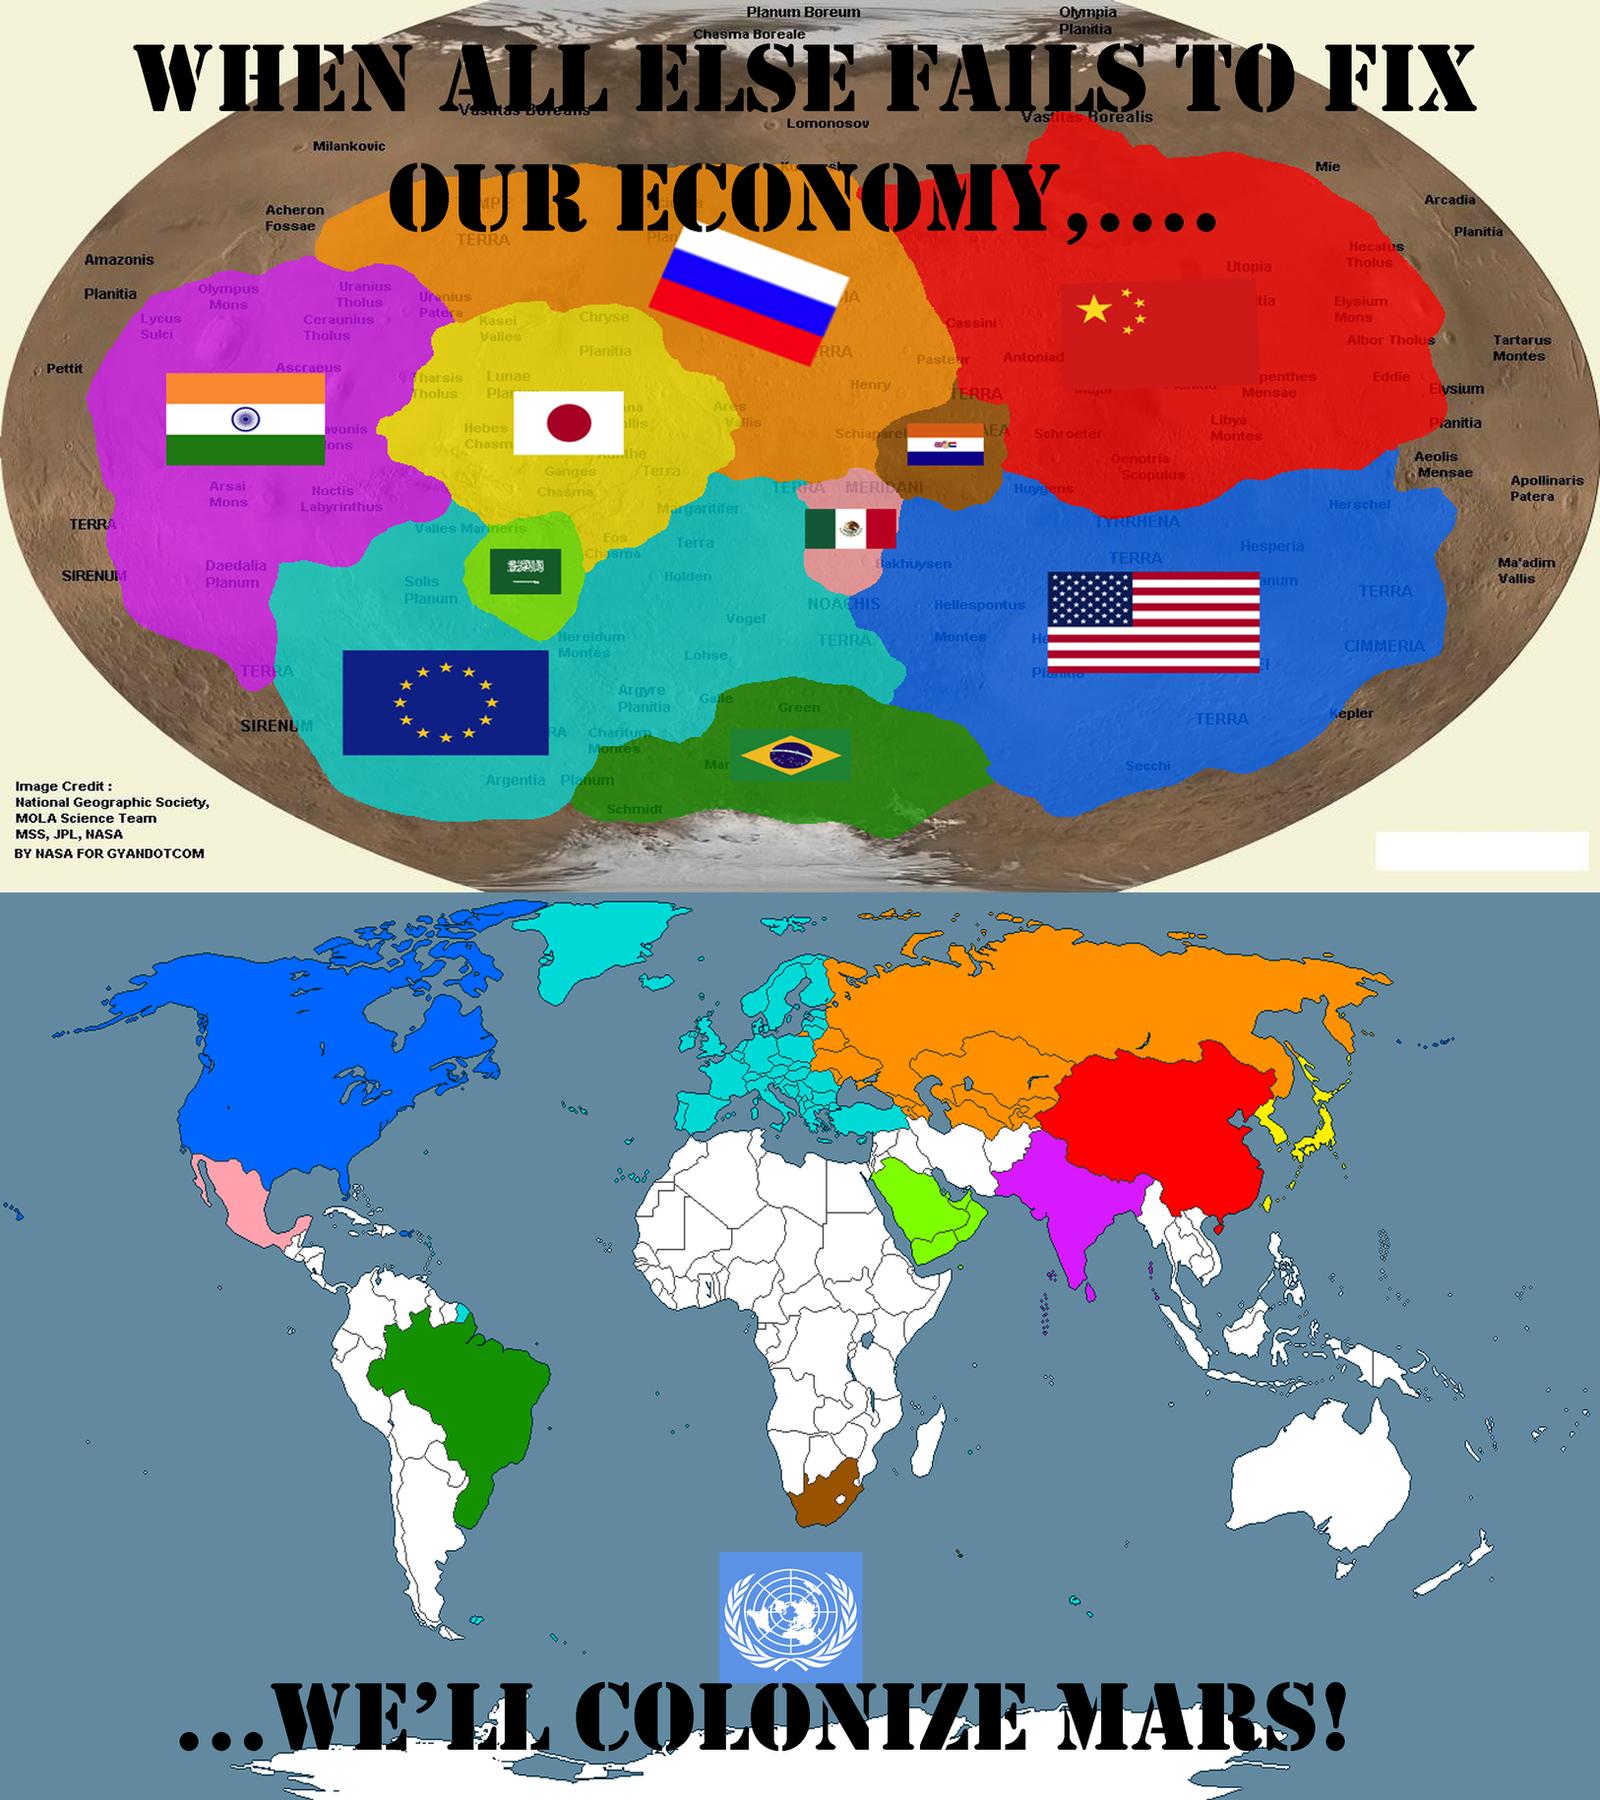 Colonize Mars 2050 Propaganda By Generalhelghast On Deviantart